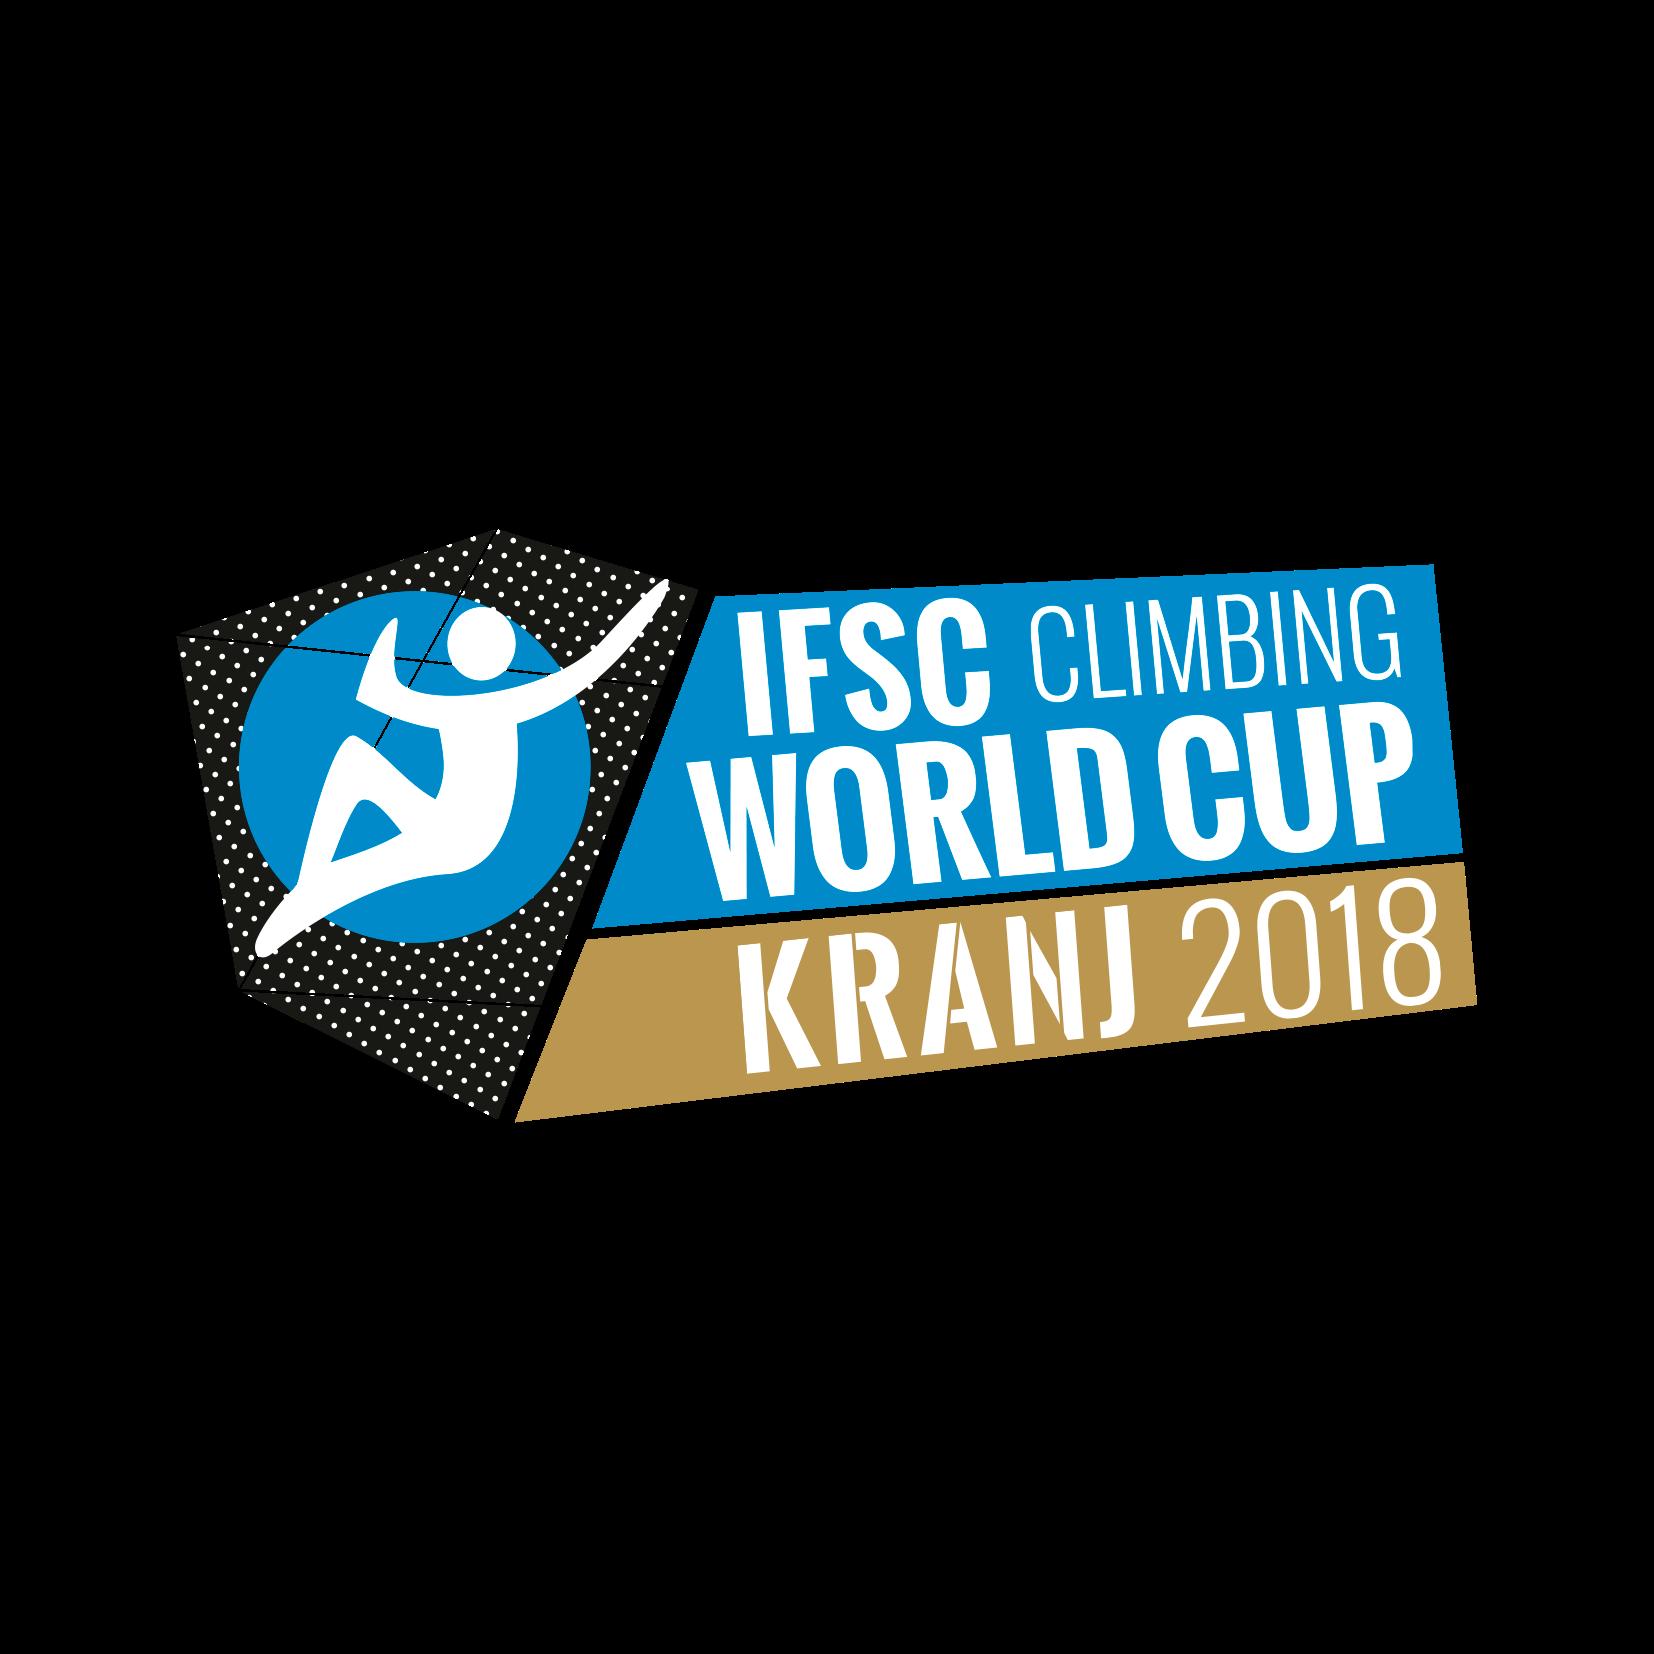 2018 IFSC Climbing World Cup